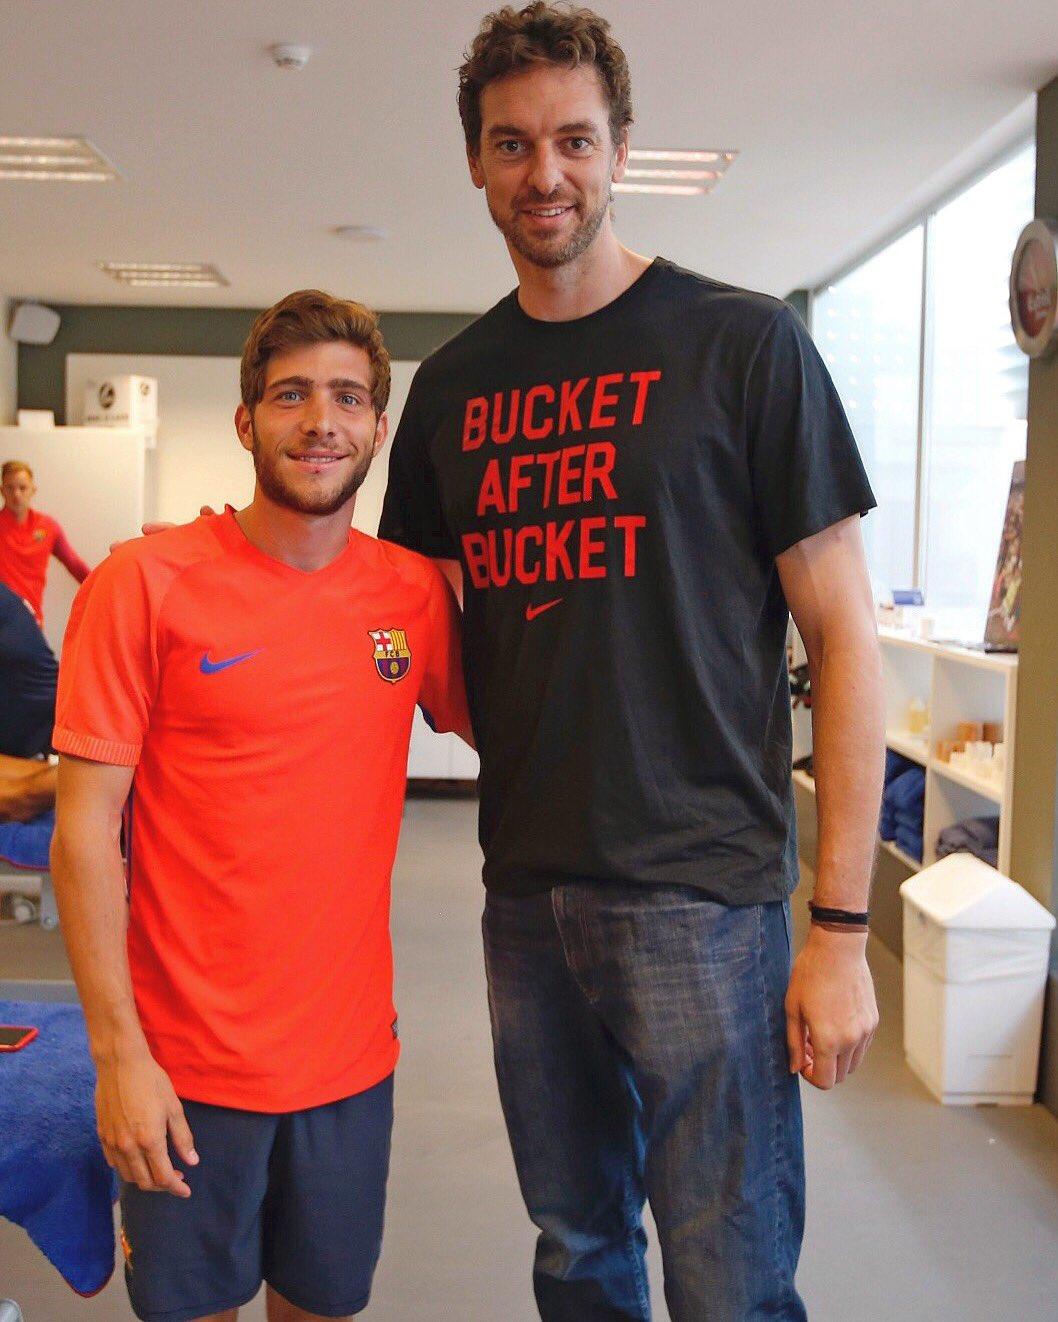 ¿Cuánto mide Sergi Roberto? - Altura - Real height CsU4JxdWAAAC_HN?format=jpg&name=large